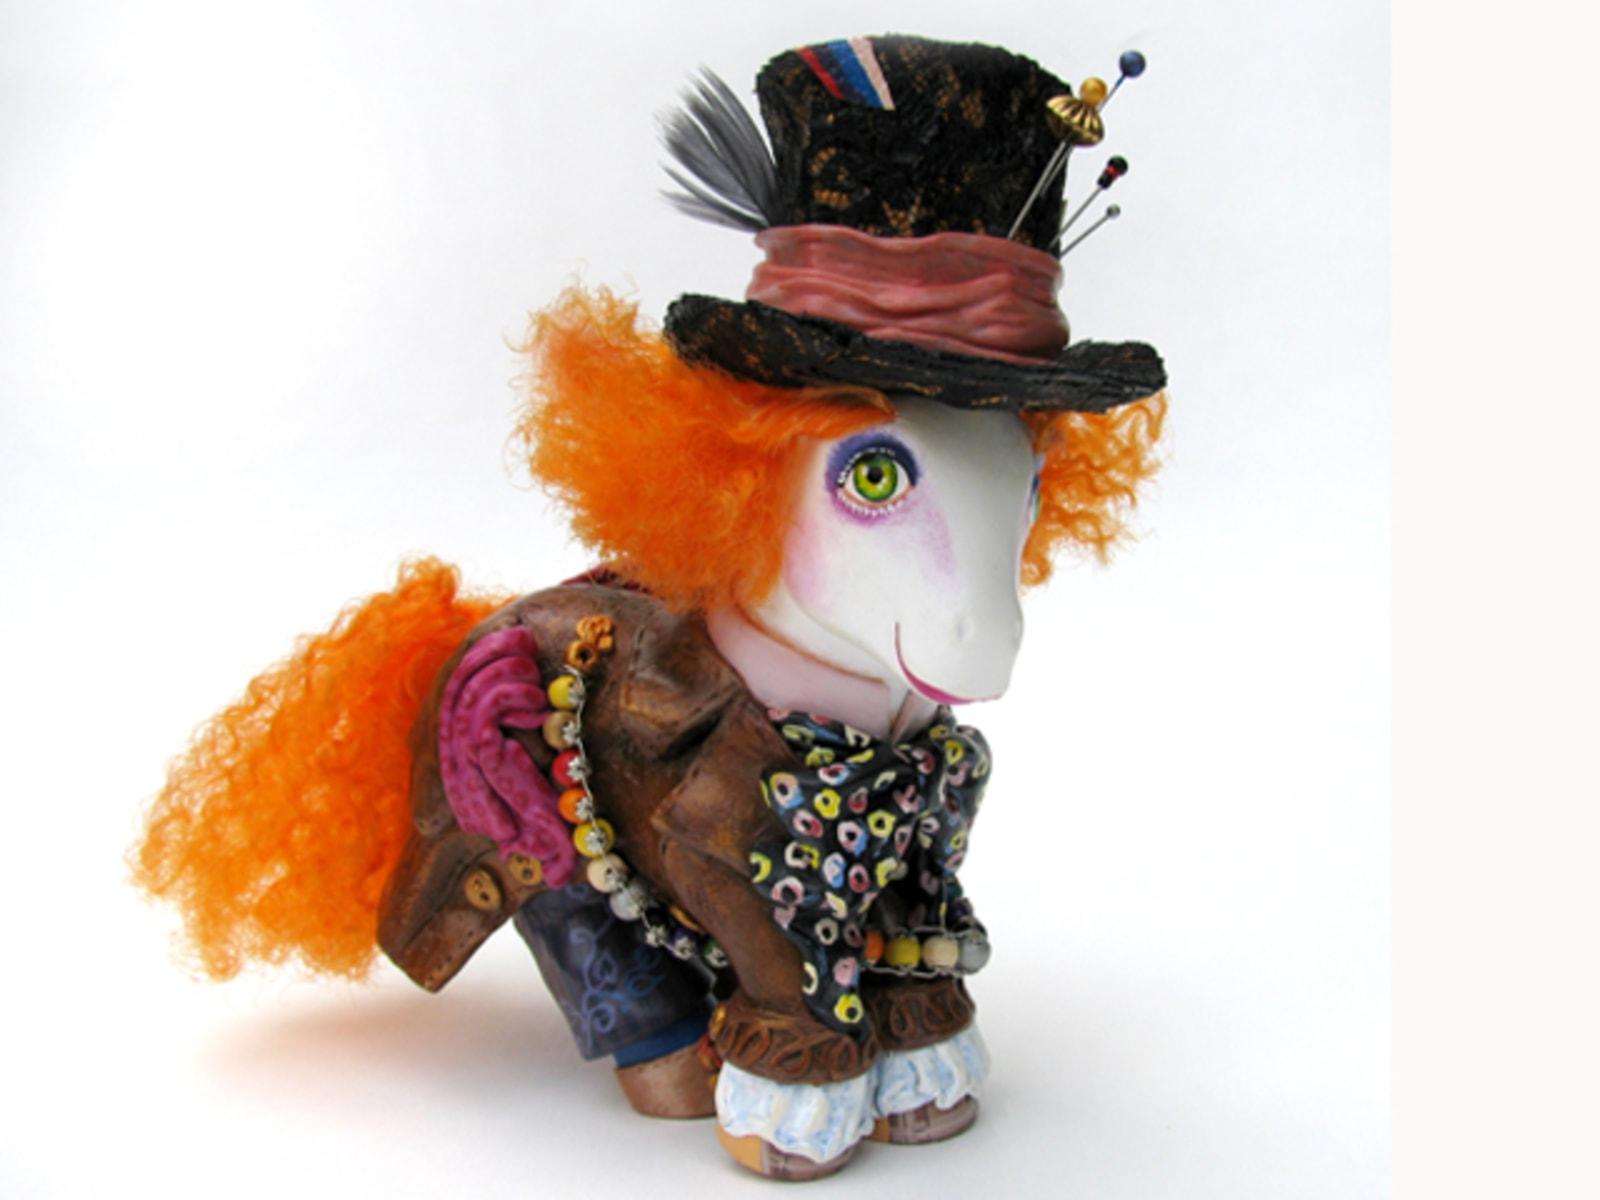 My Little Pony art by Mari Kasurinen - Nov 2010